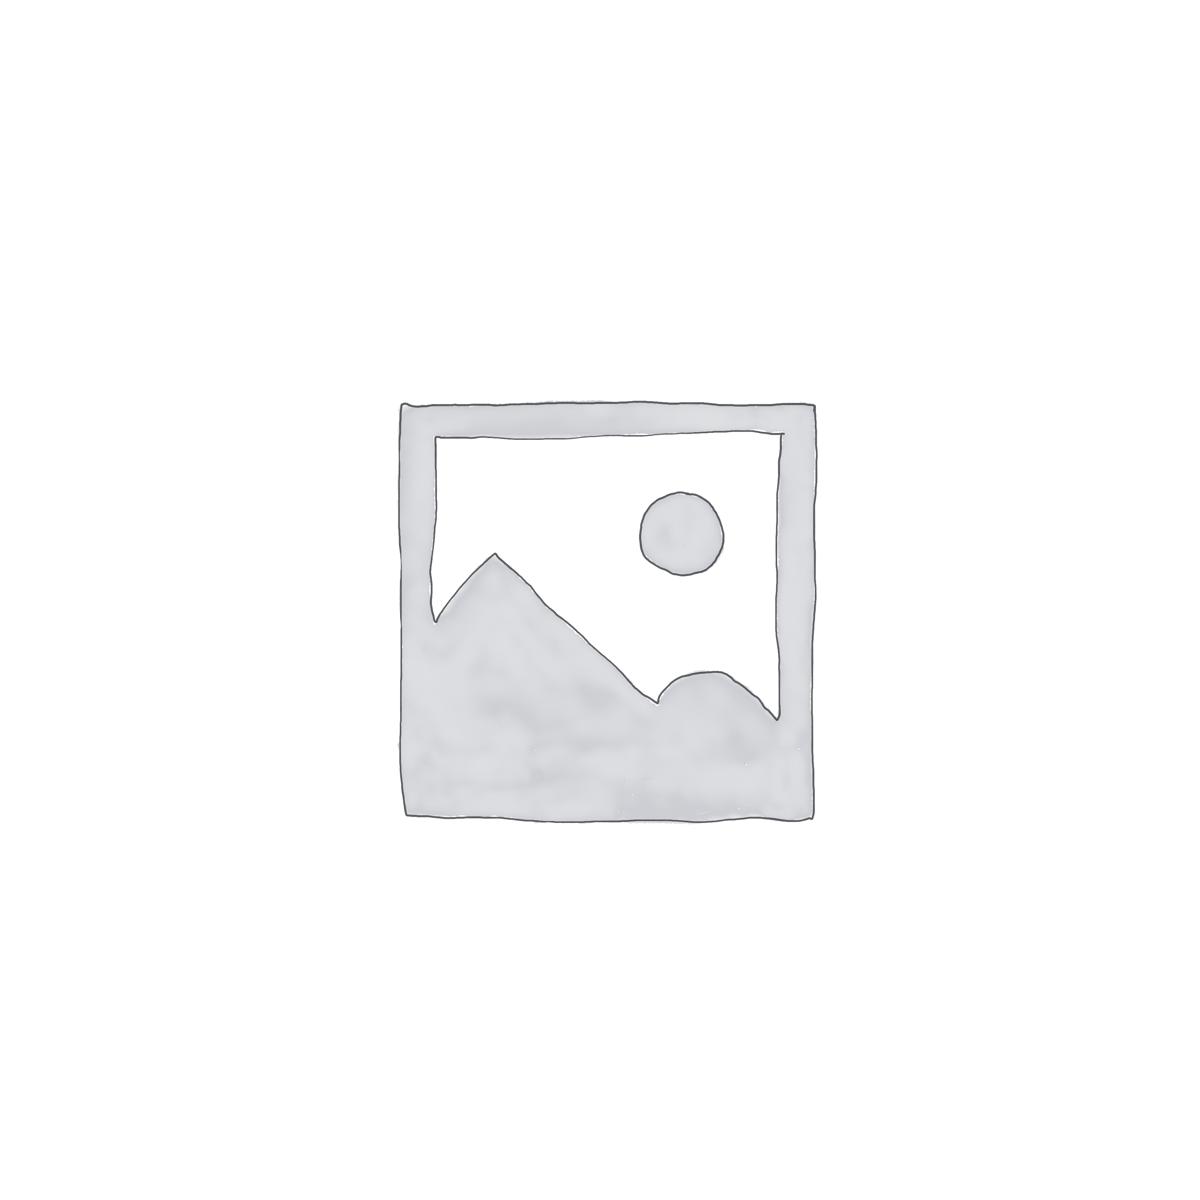 vinedo-1b-otono